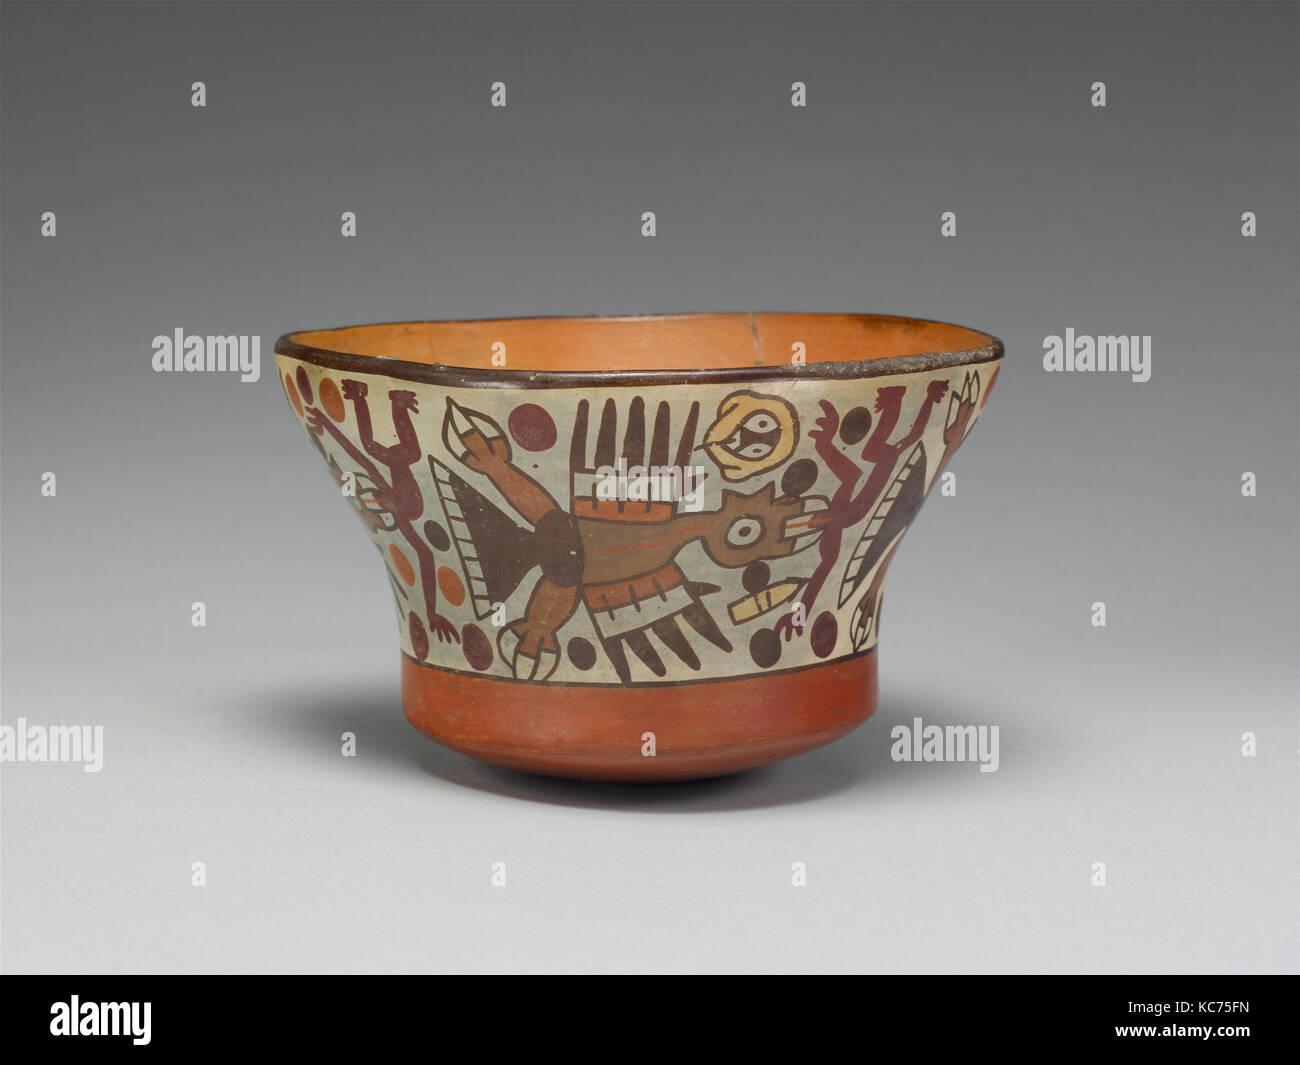 Schüssel, 2./4. Jahrhunderts, Peru, Nazca, Keramik, H x W x D 3 3/8 x 5 1/2 x 7 3/4 in. (8,6 x 14 x 19,7 cm), Stockbild